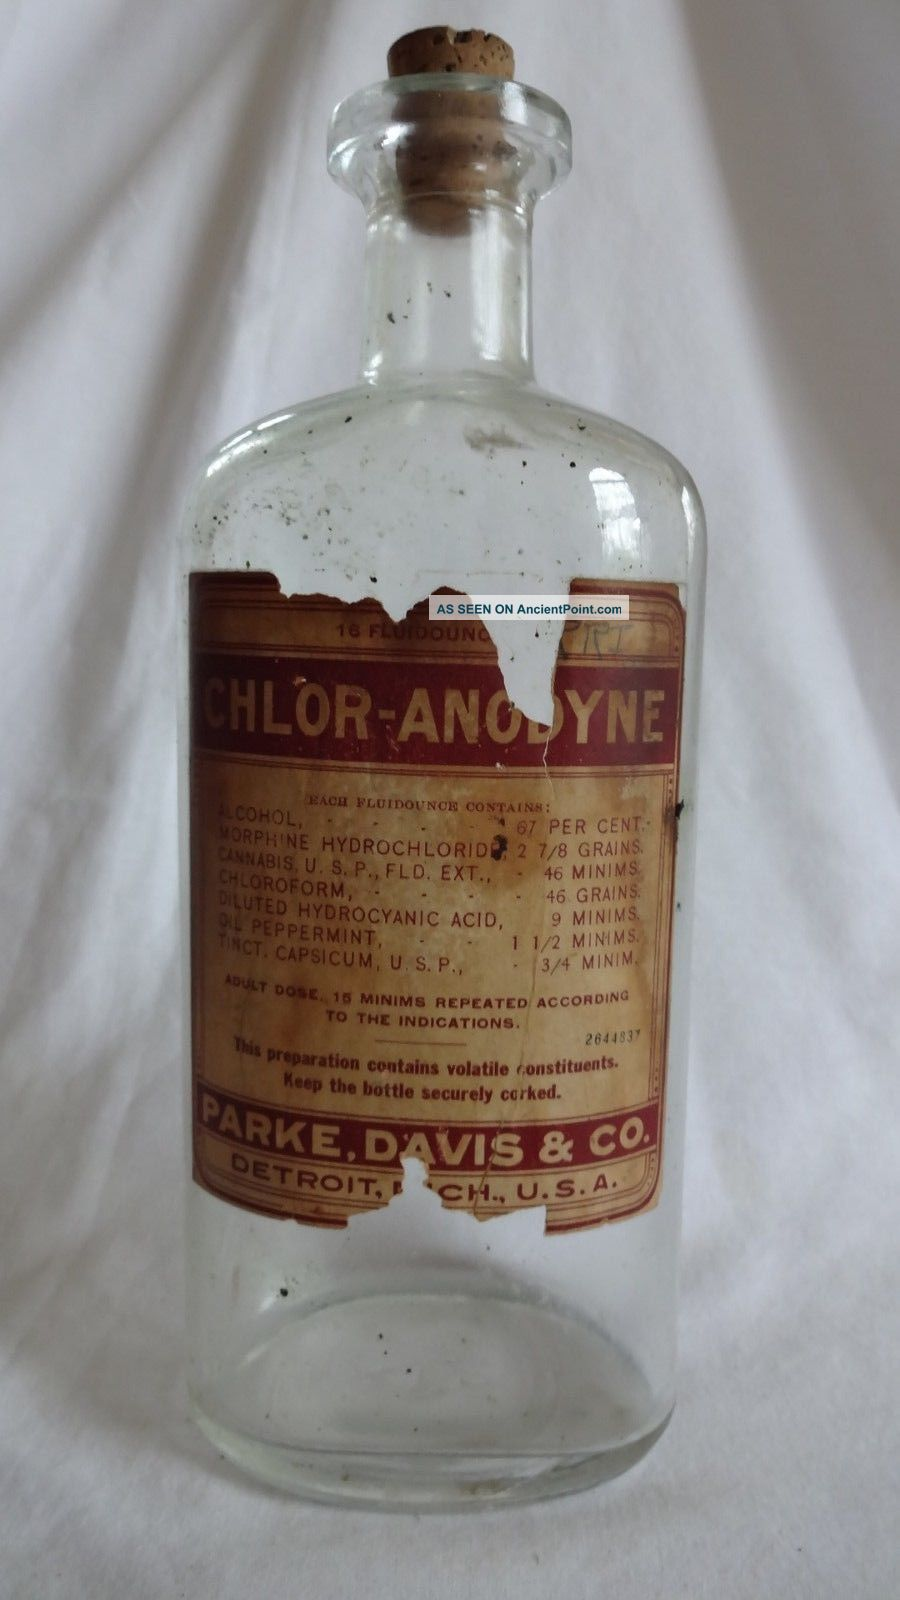 Antique Cannabis Morphine Parke Davis Apothecary Marijuana Extract Bottle Bottles & Jars photo